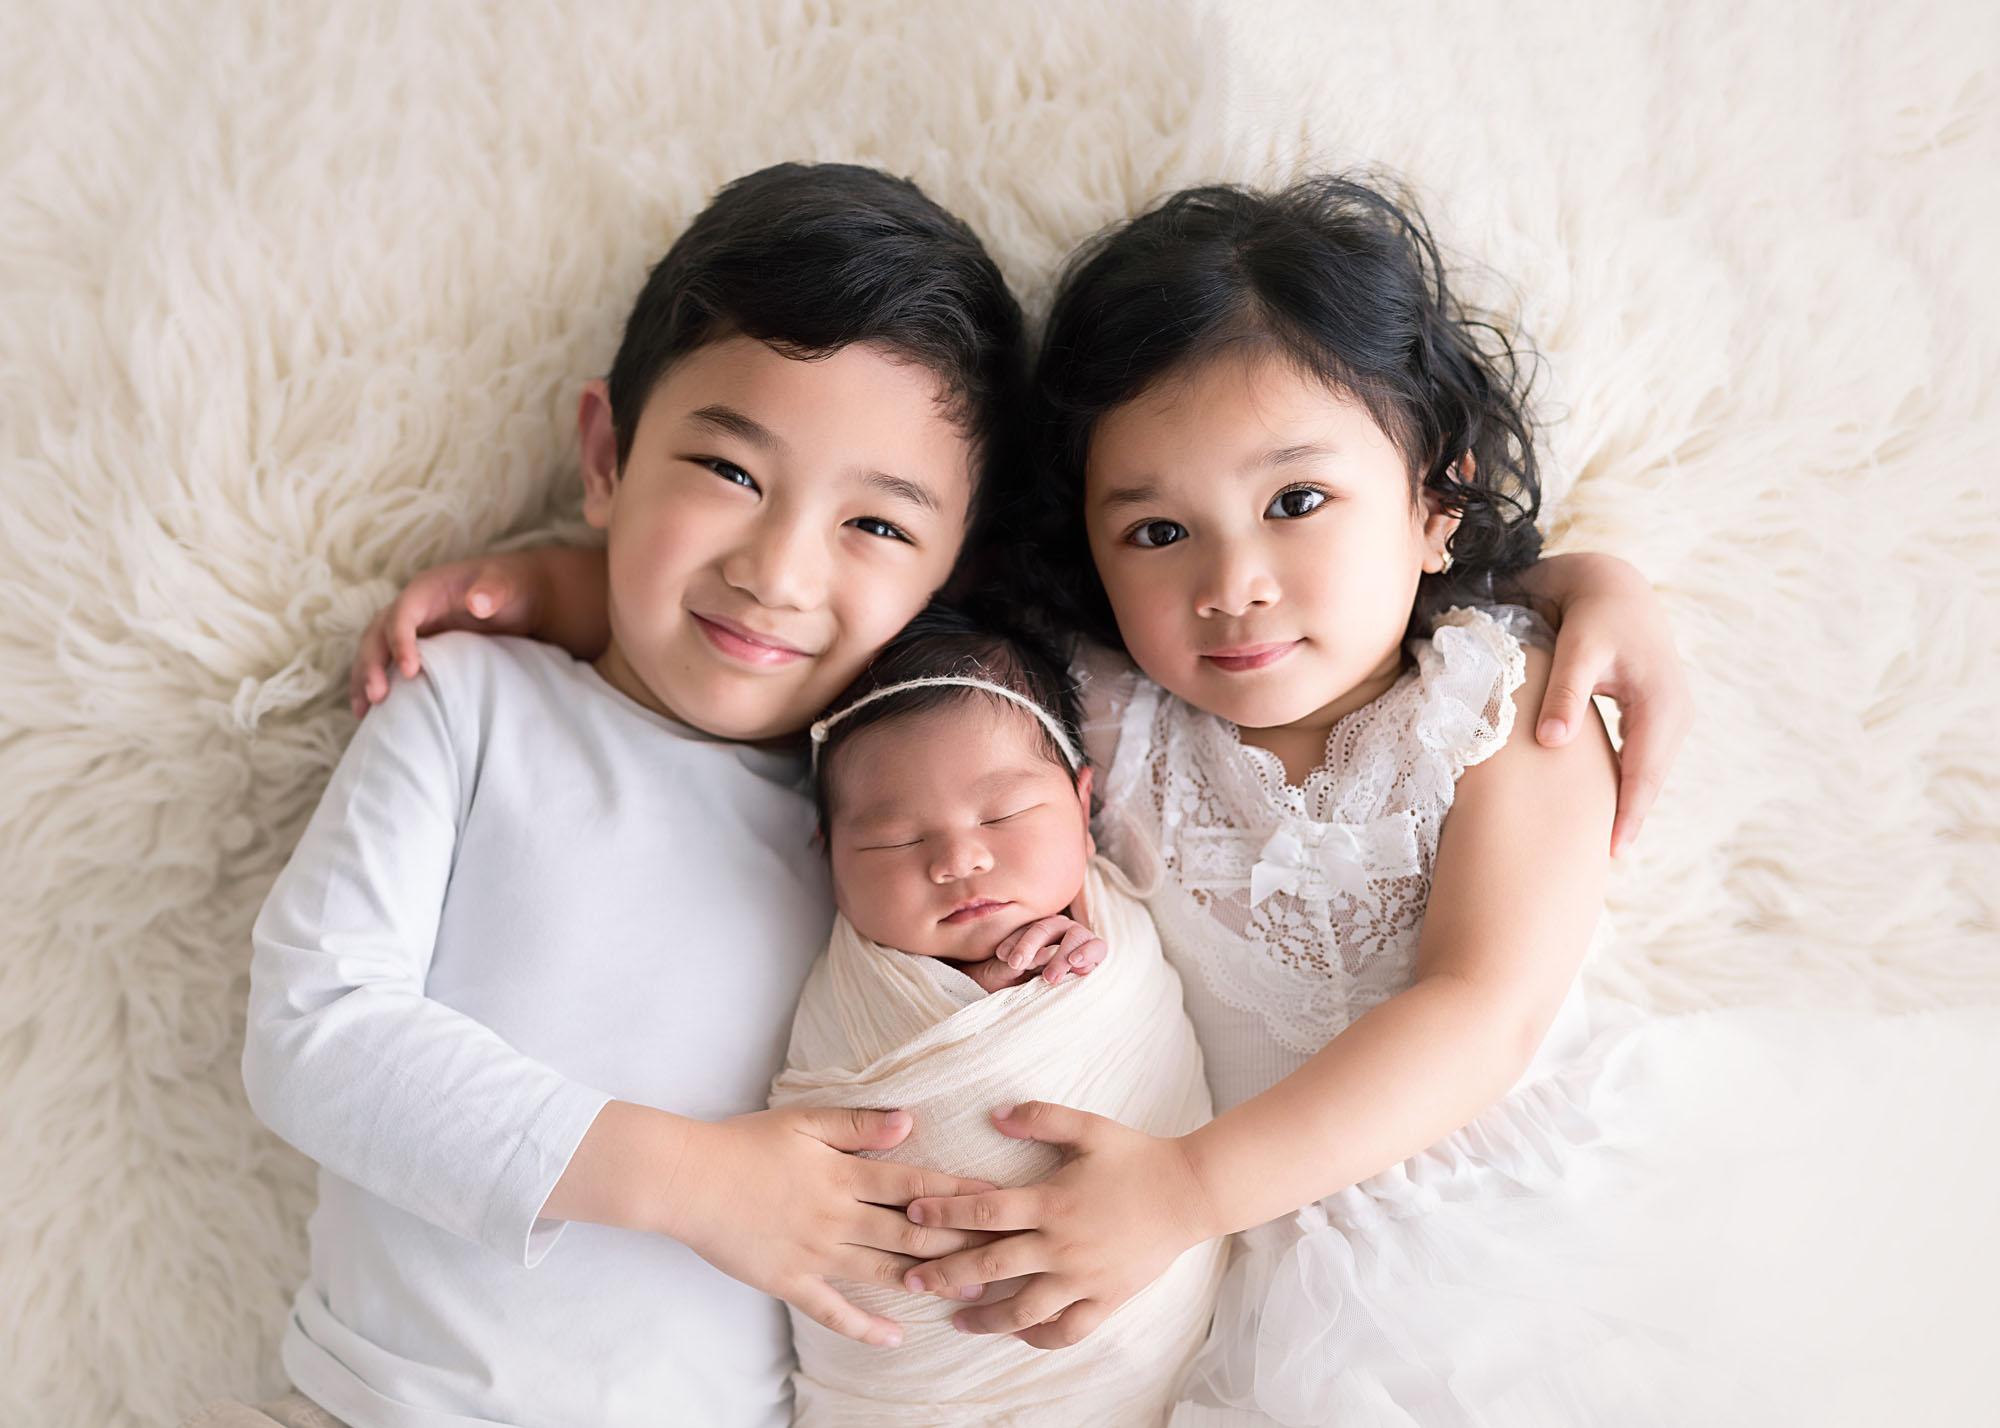 newborn-photography-tory-d-melbourne19.jpg